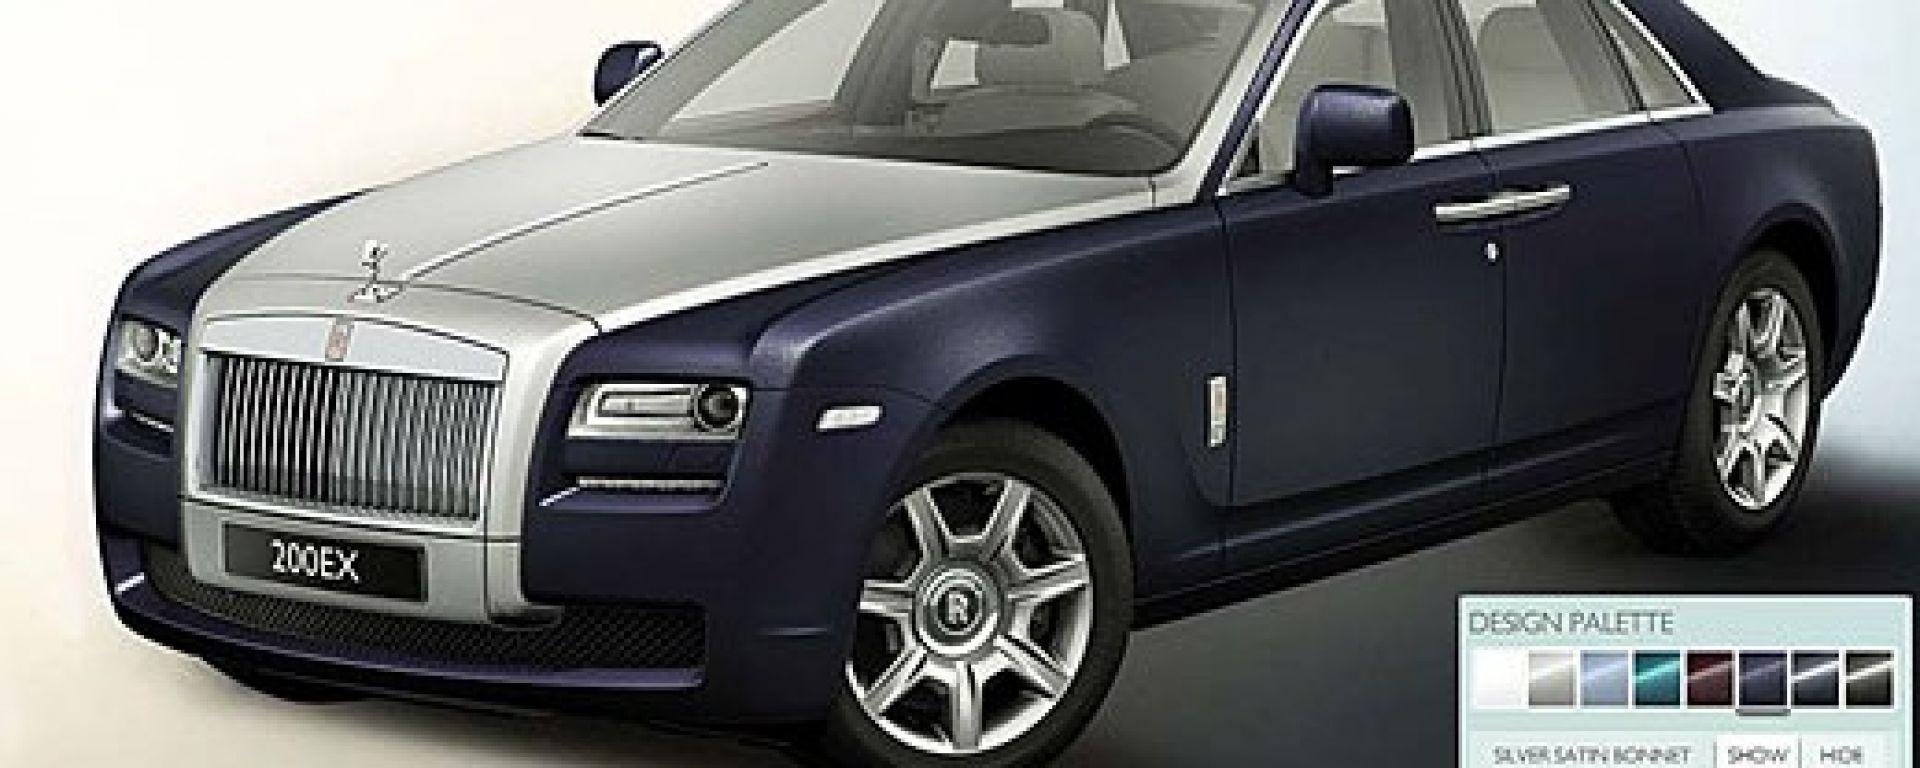 Rolls-Royce Ghost, le nuove immagini